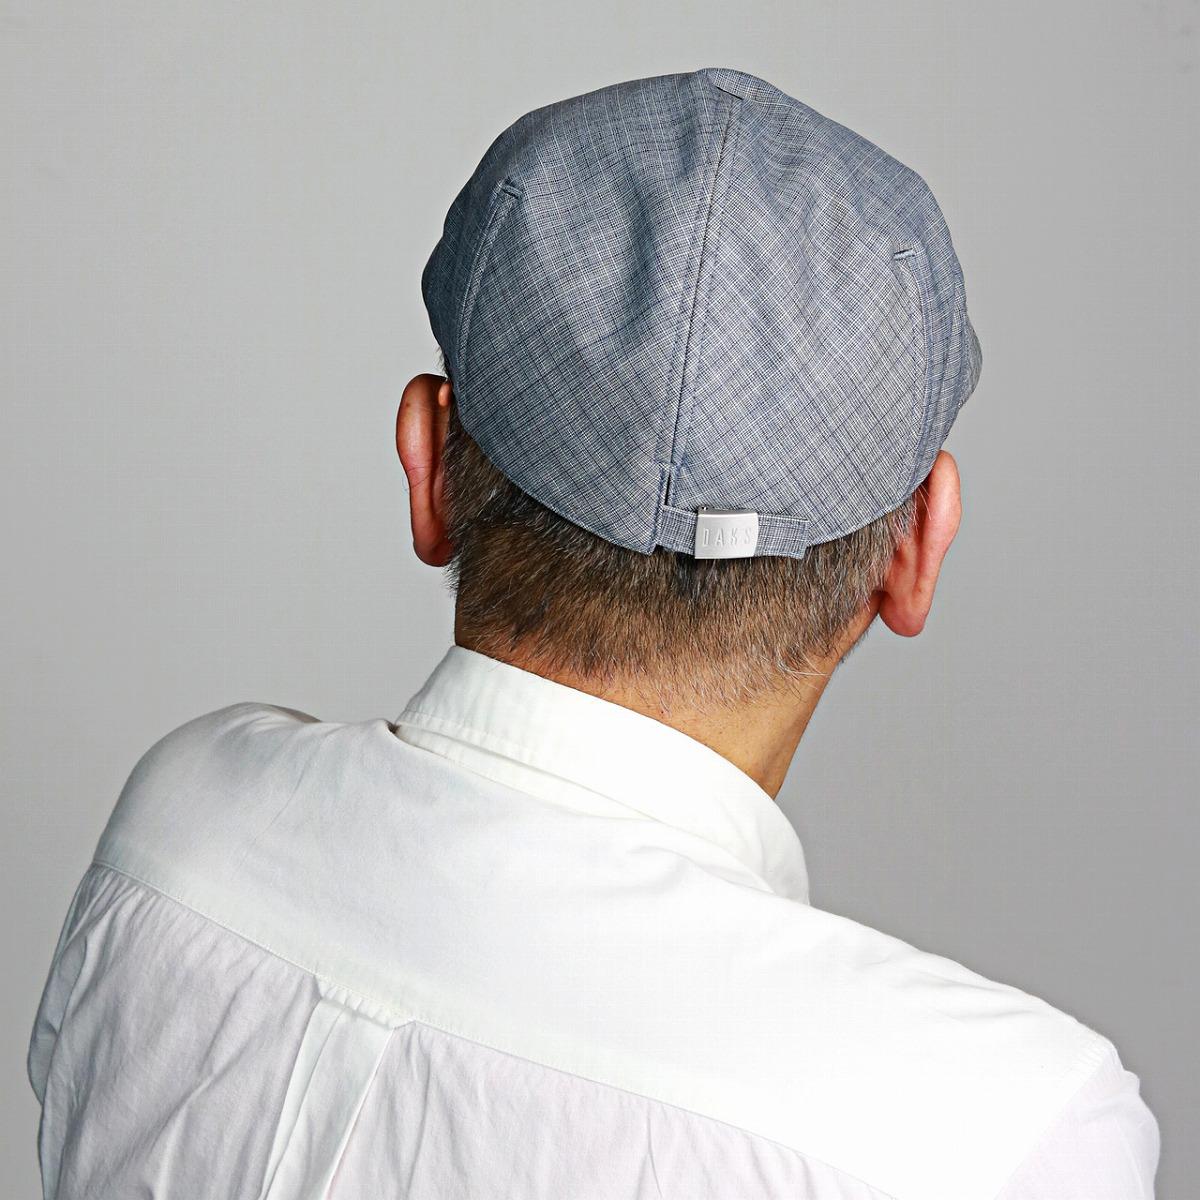 dbcf3d8172d It is a gift present in the size S M L LL hunting cap hat unisex Monaco  hunting cap U.K. brand   gray  ivy cap  Father s Day when Shin pull plain  fabric ...